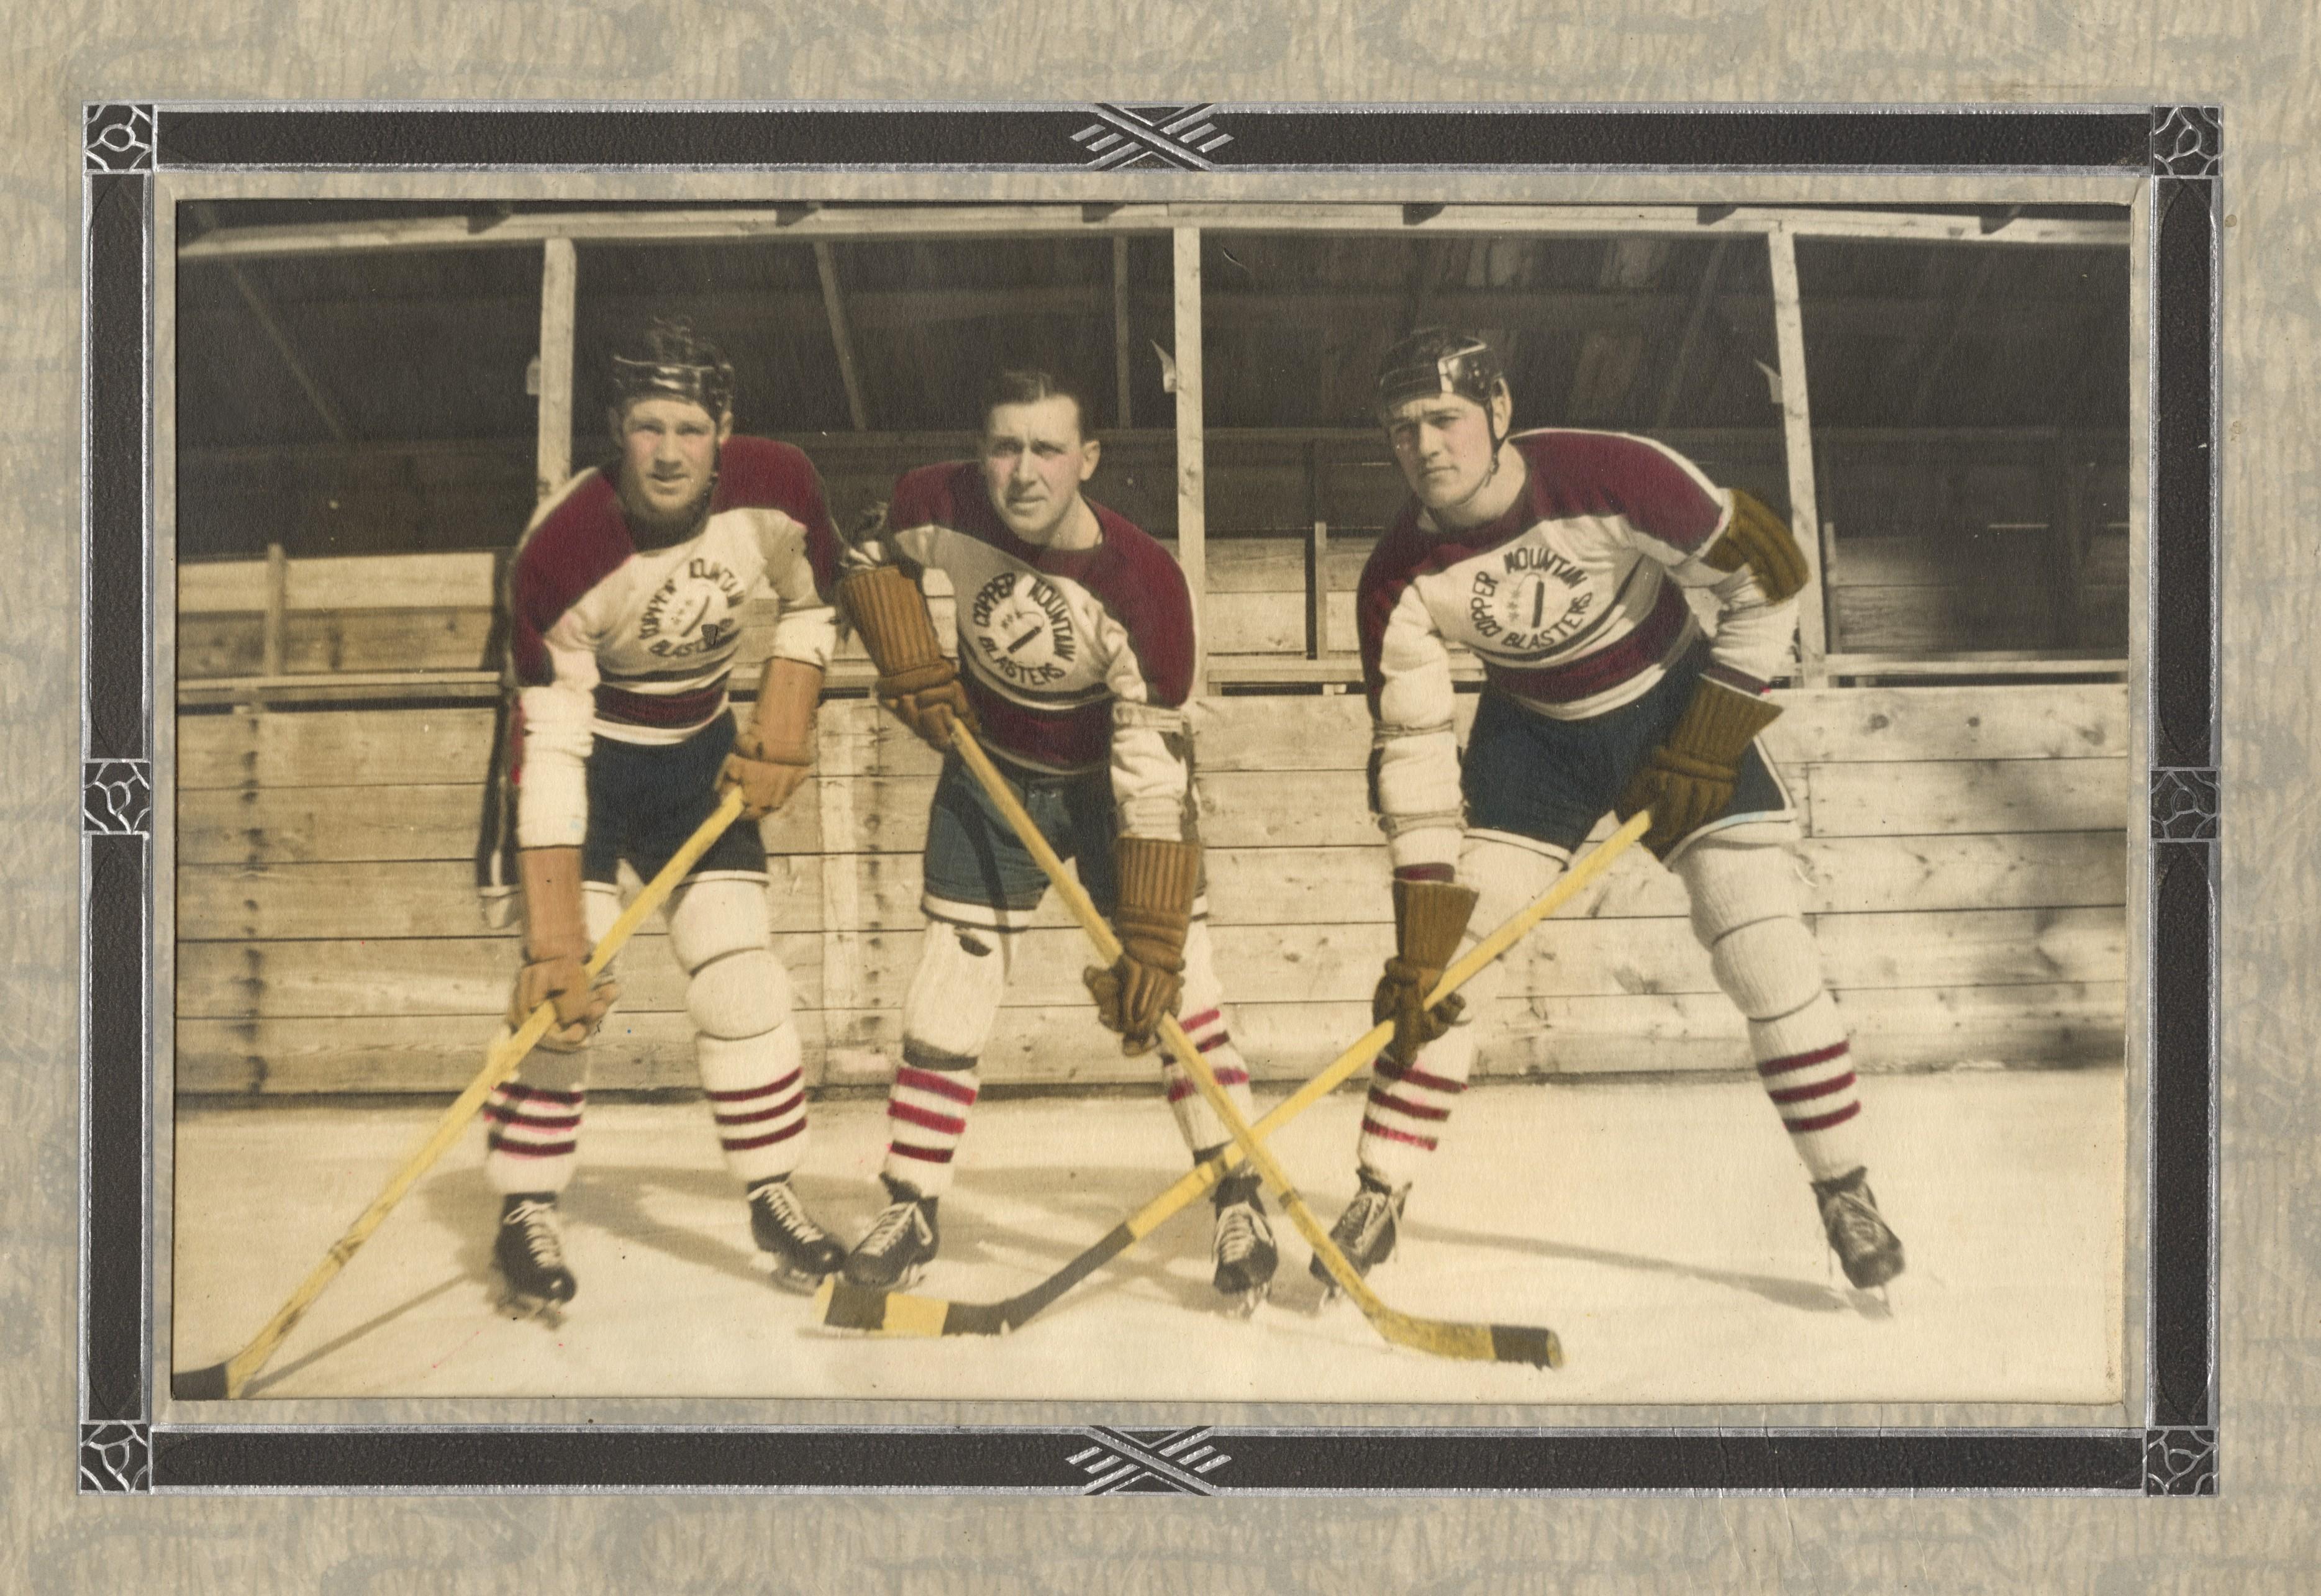 photos Vintage hockey